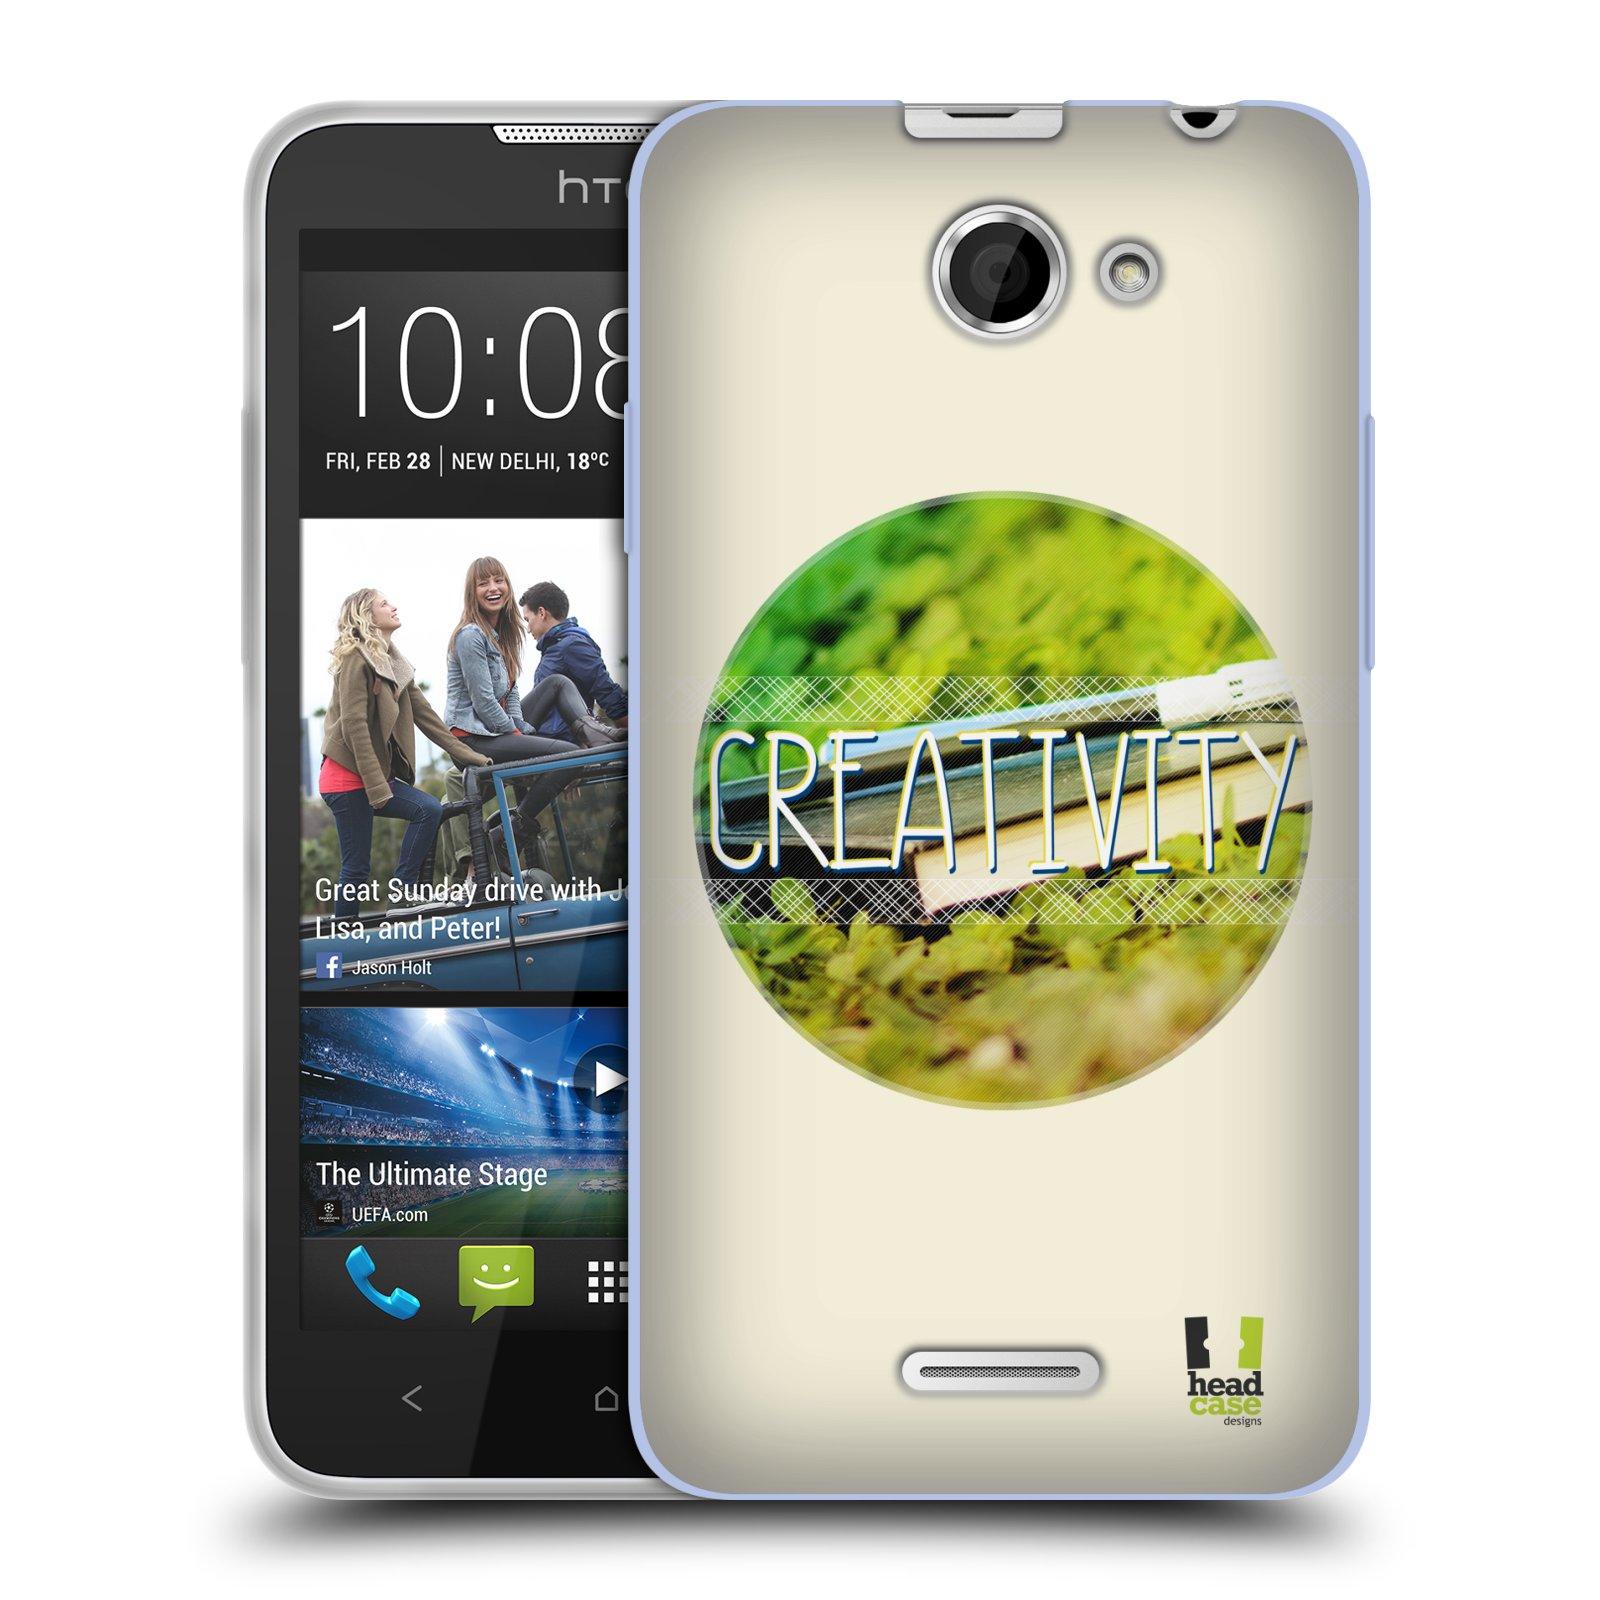 Silikonové pouzdro na mobil HTC Desire 516 HEAD CASE INSPIRACE V KRUHU KREATIVITA (Silikonový kryt či obal na mobilní telefon HTC Desire 516 Dual SIM)